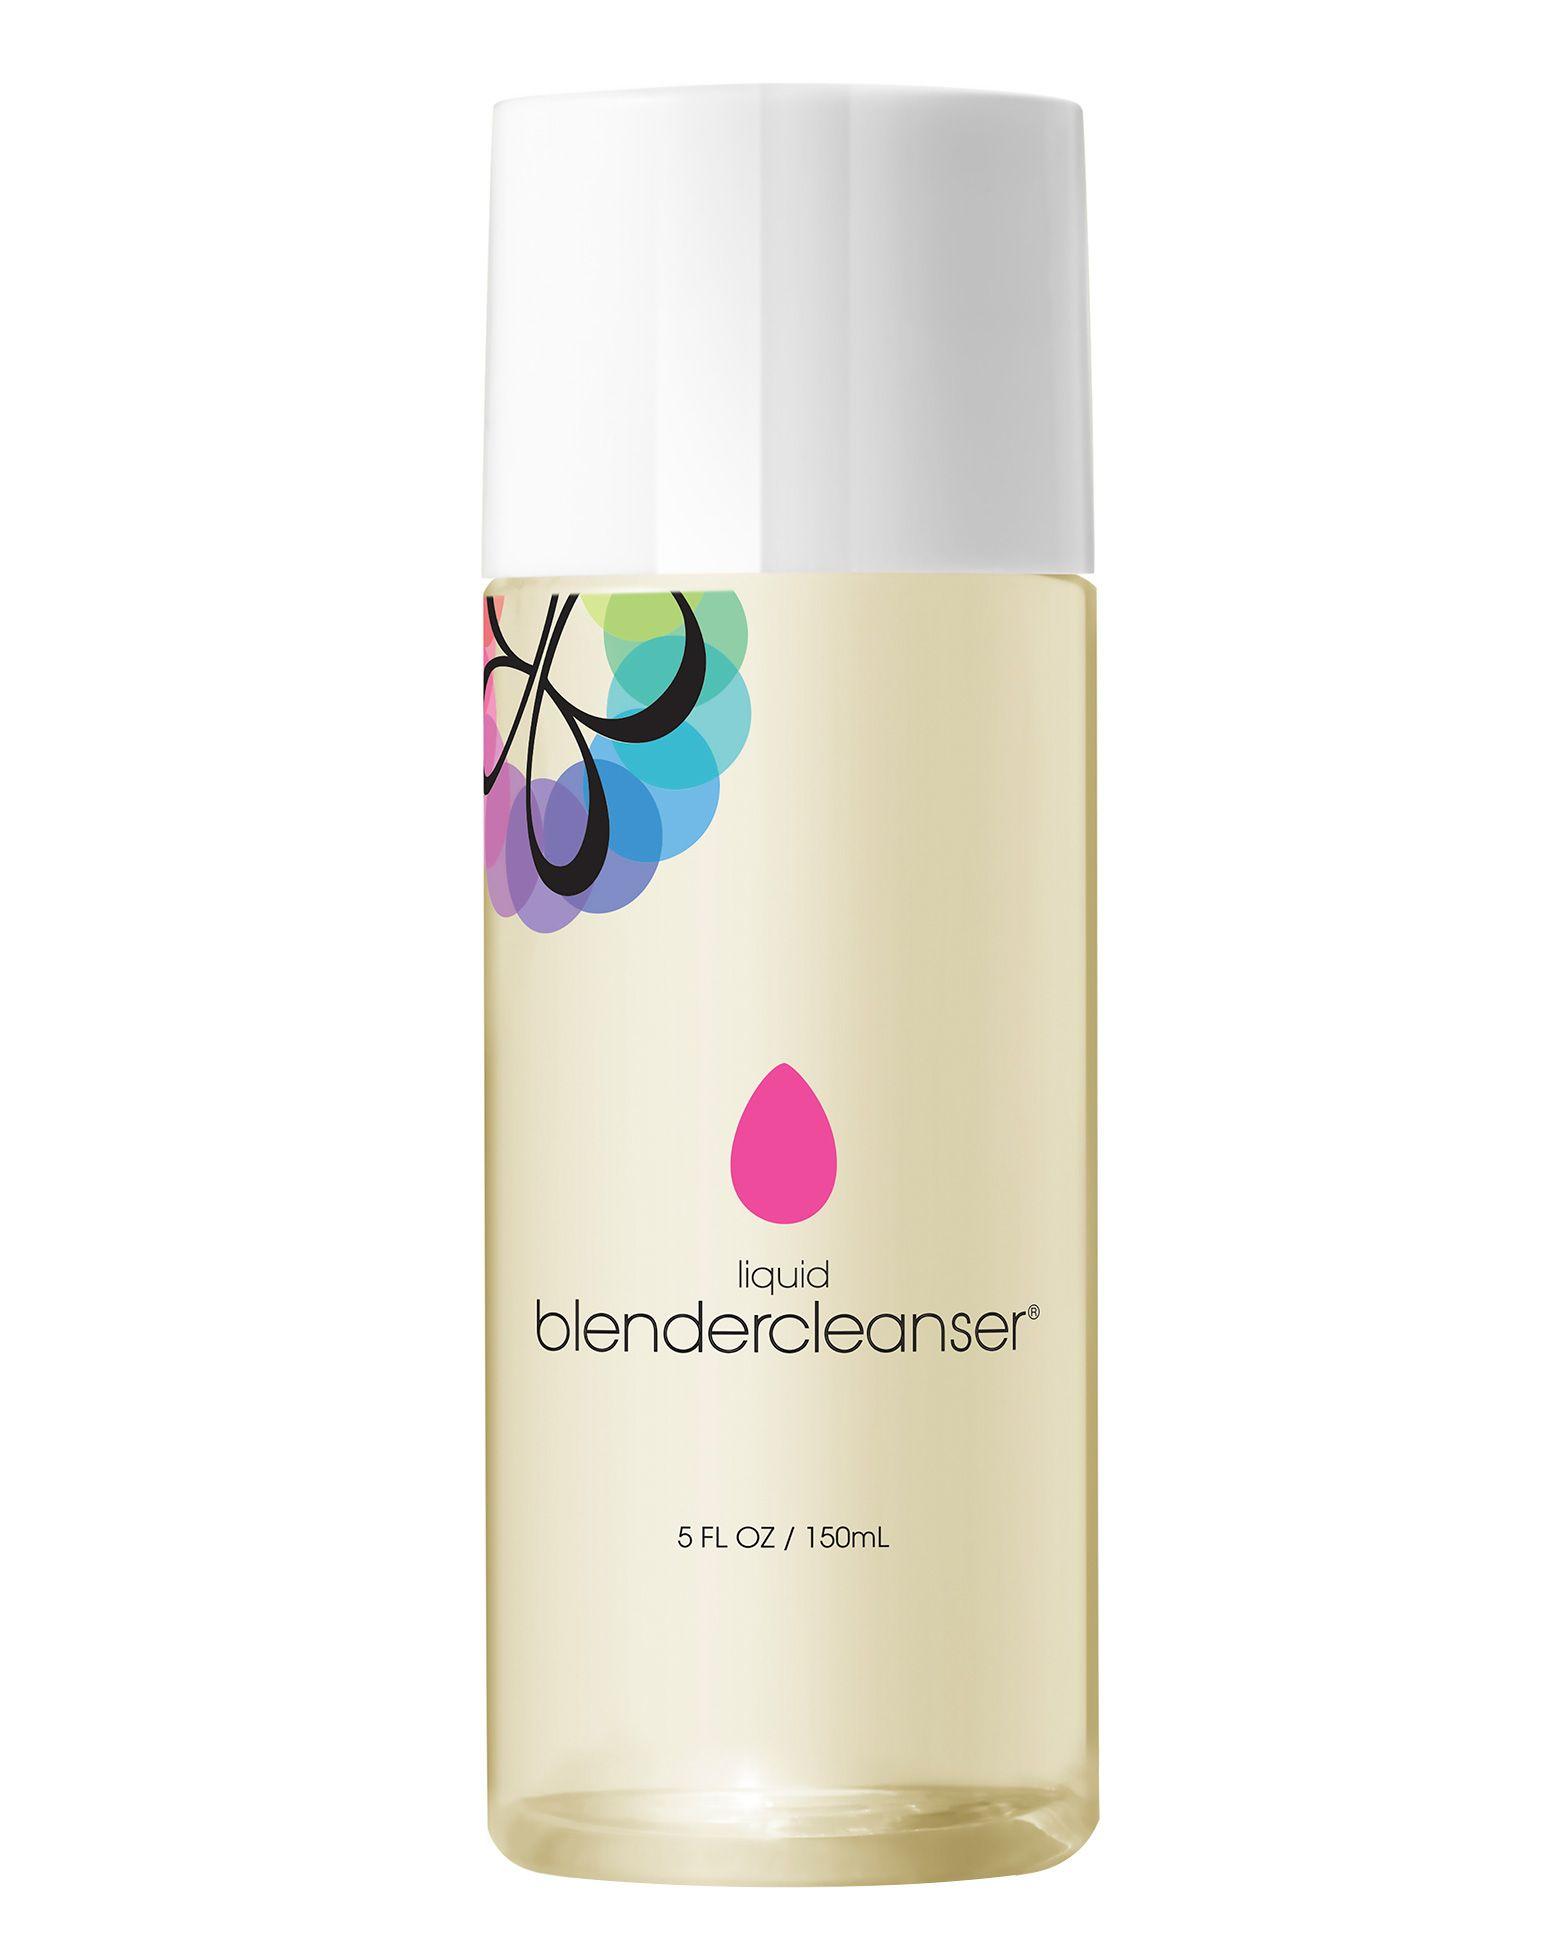 Gloryblender makeup cleanser